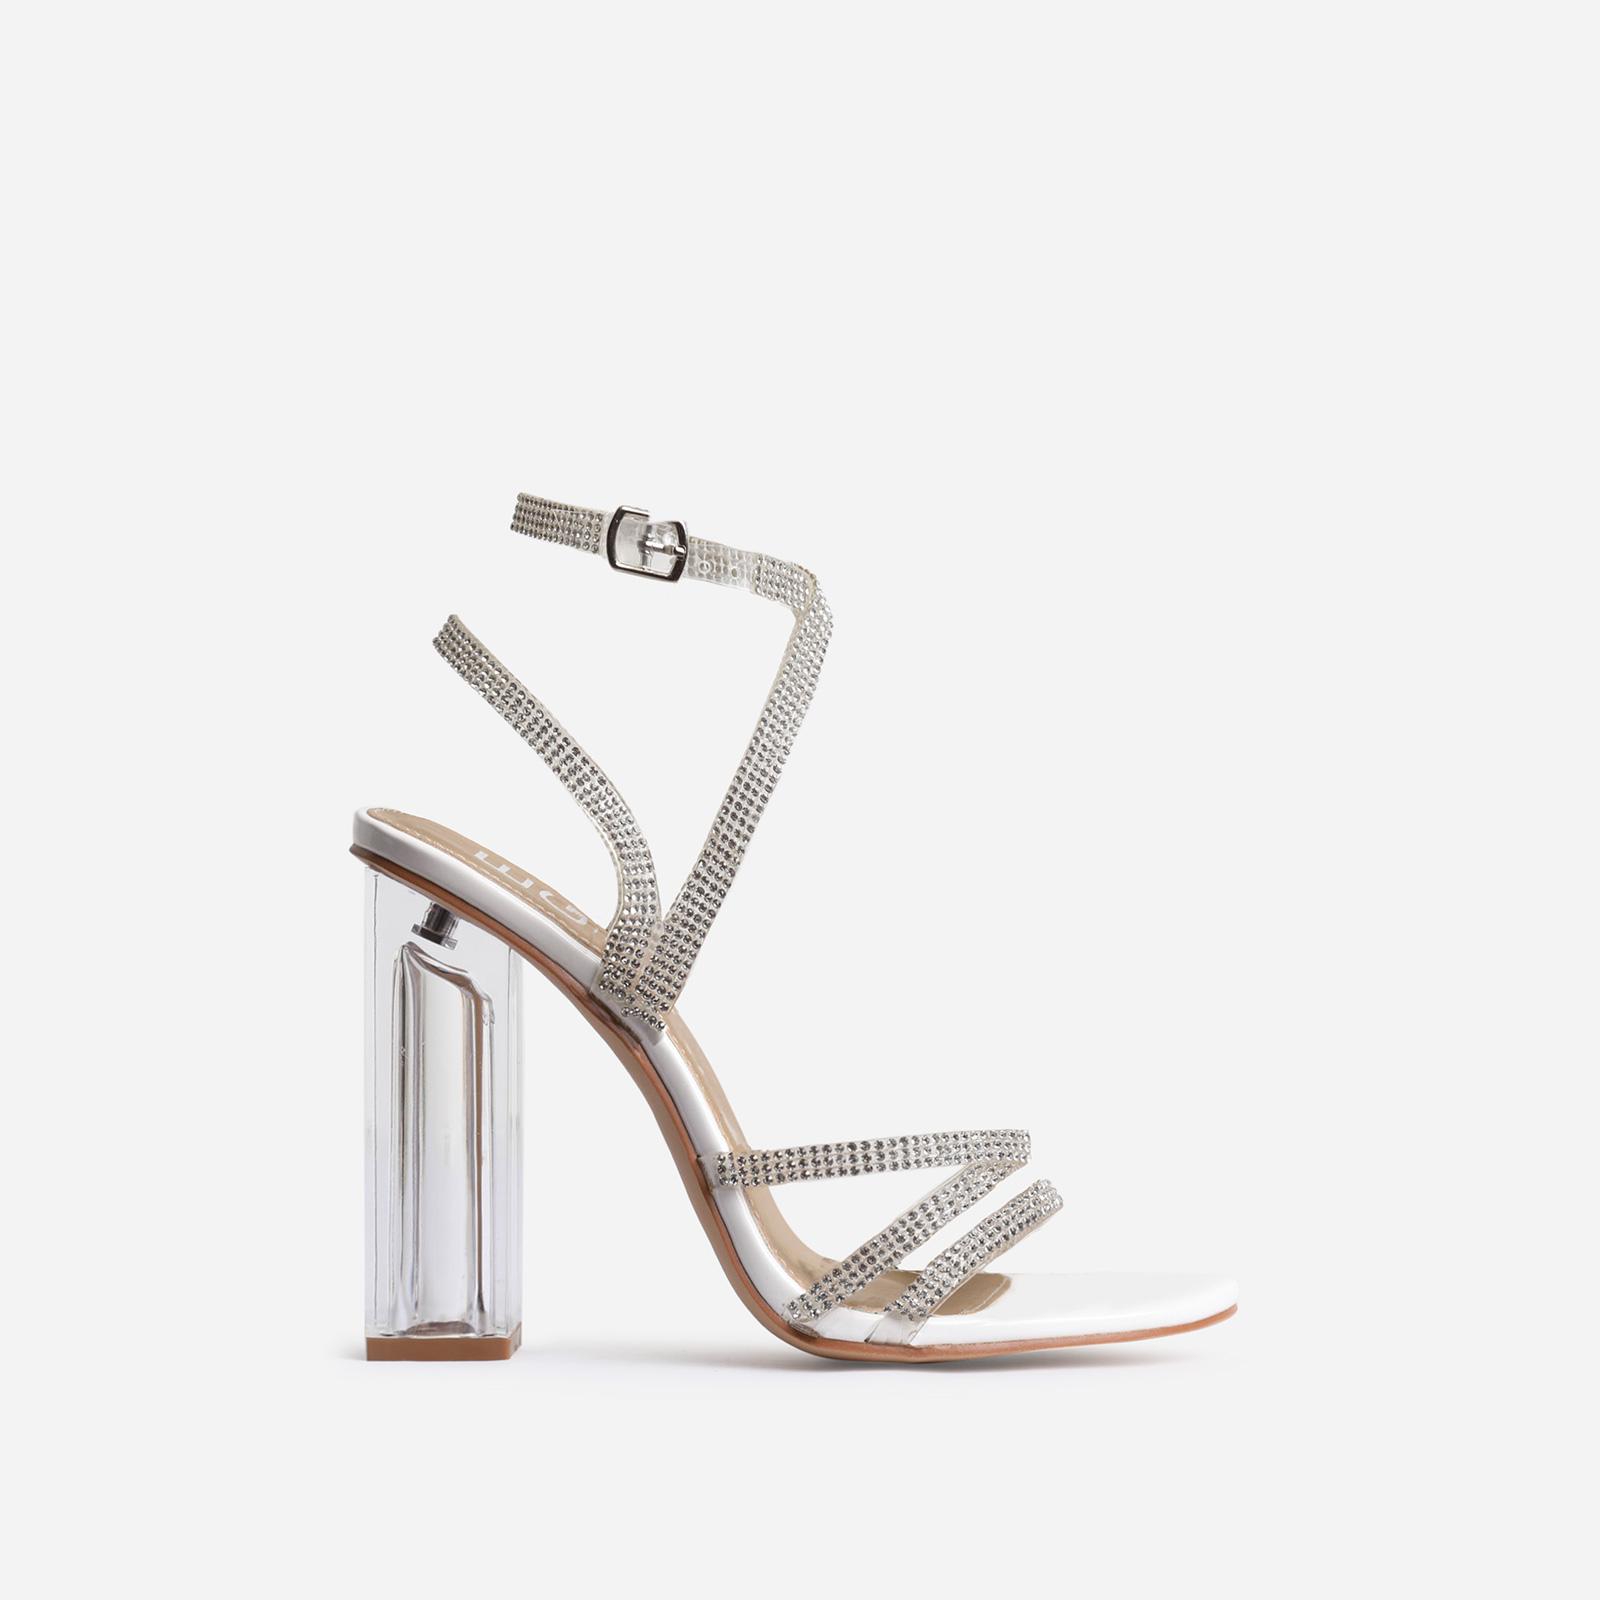 Dash Diamante Detail Clear Perspex Block Heel In White Patent